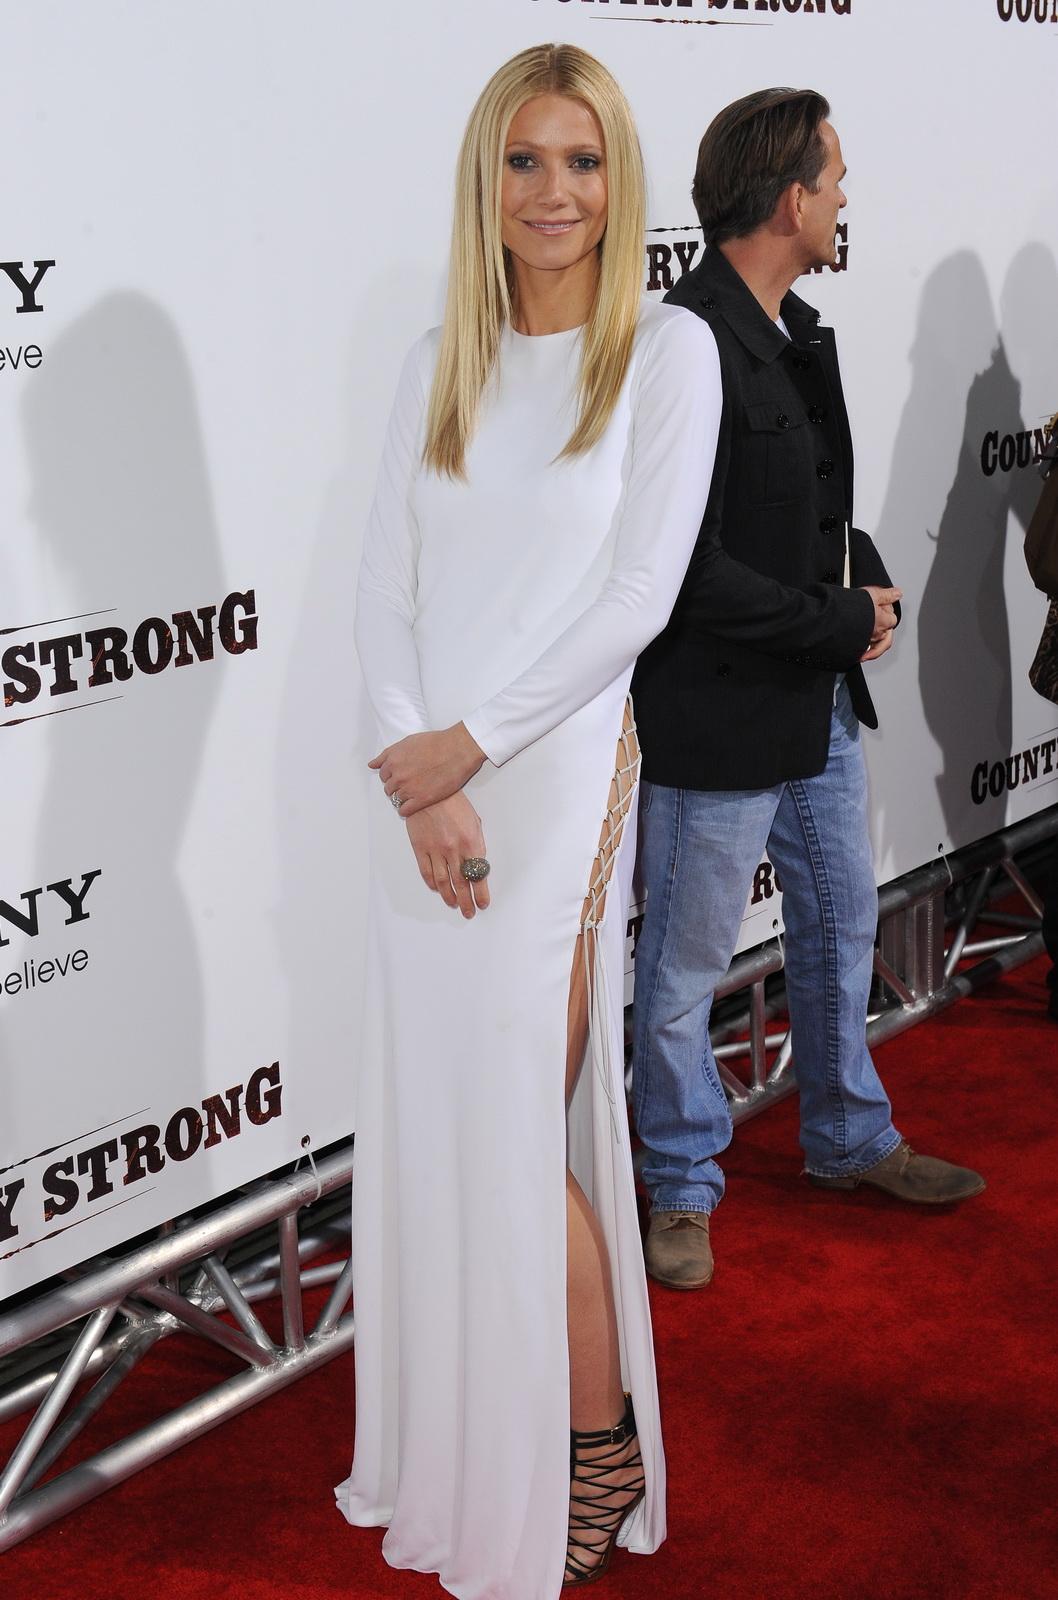 http://3.bp.blogspot.com/_NRGPIrDtEg8/TQsohSRzicI/AAAAAAAAAZ4/bq17y-RyJUs/s1600/Gwyneth_Paltrow_without_panties_and_bra_4.jpg